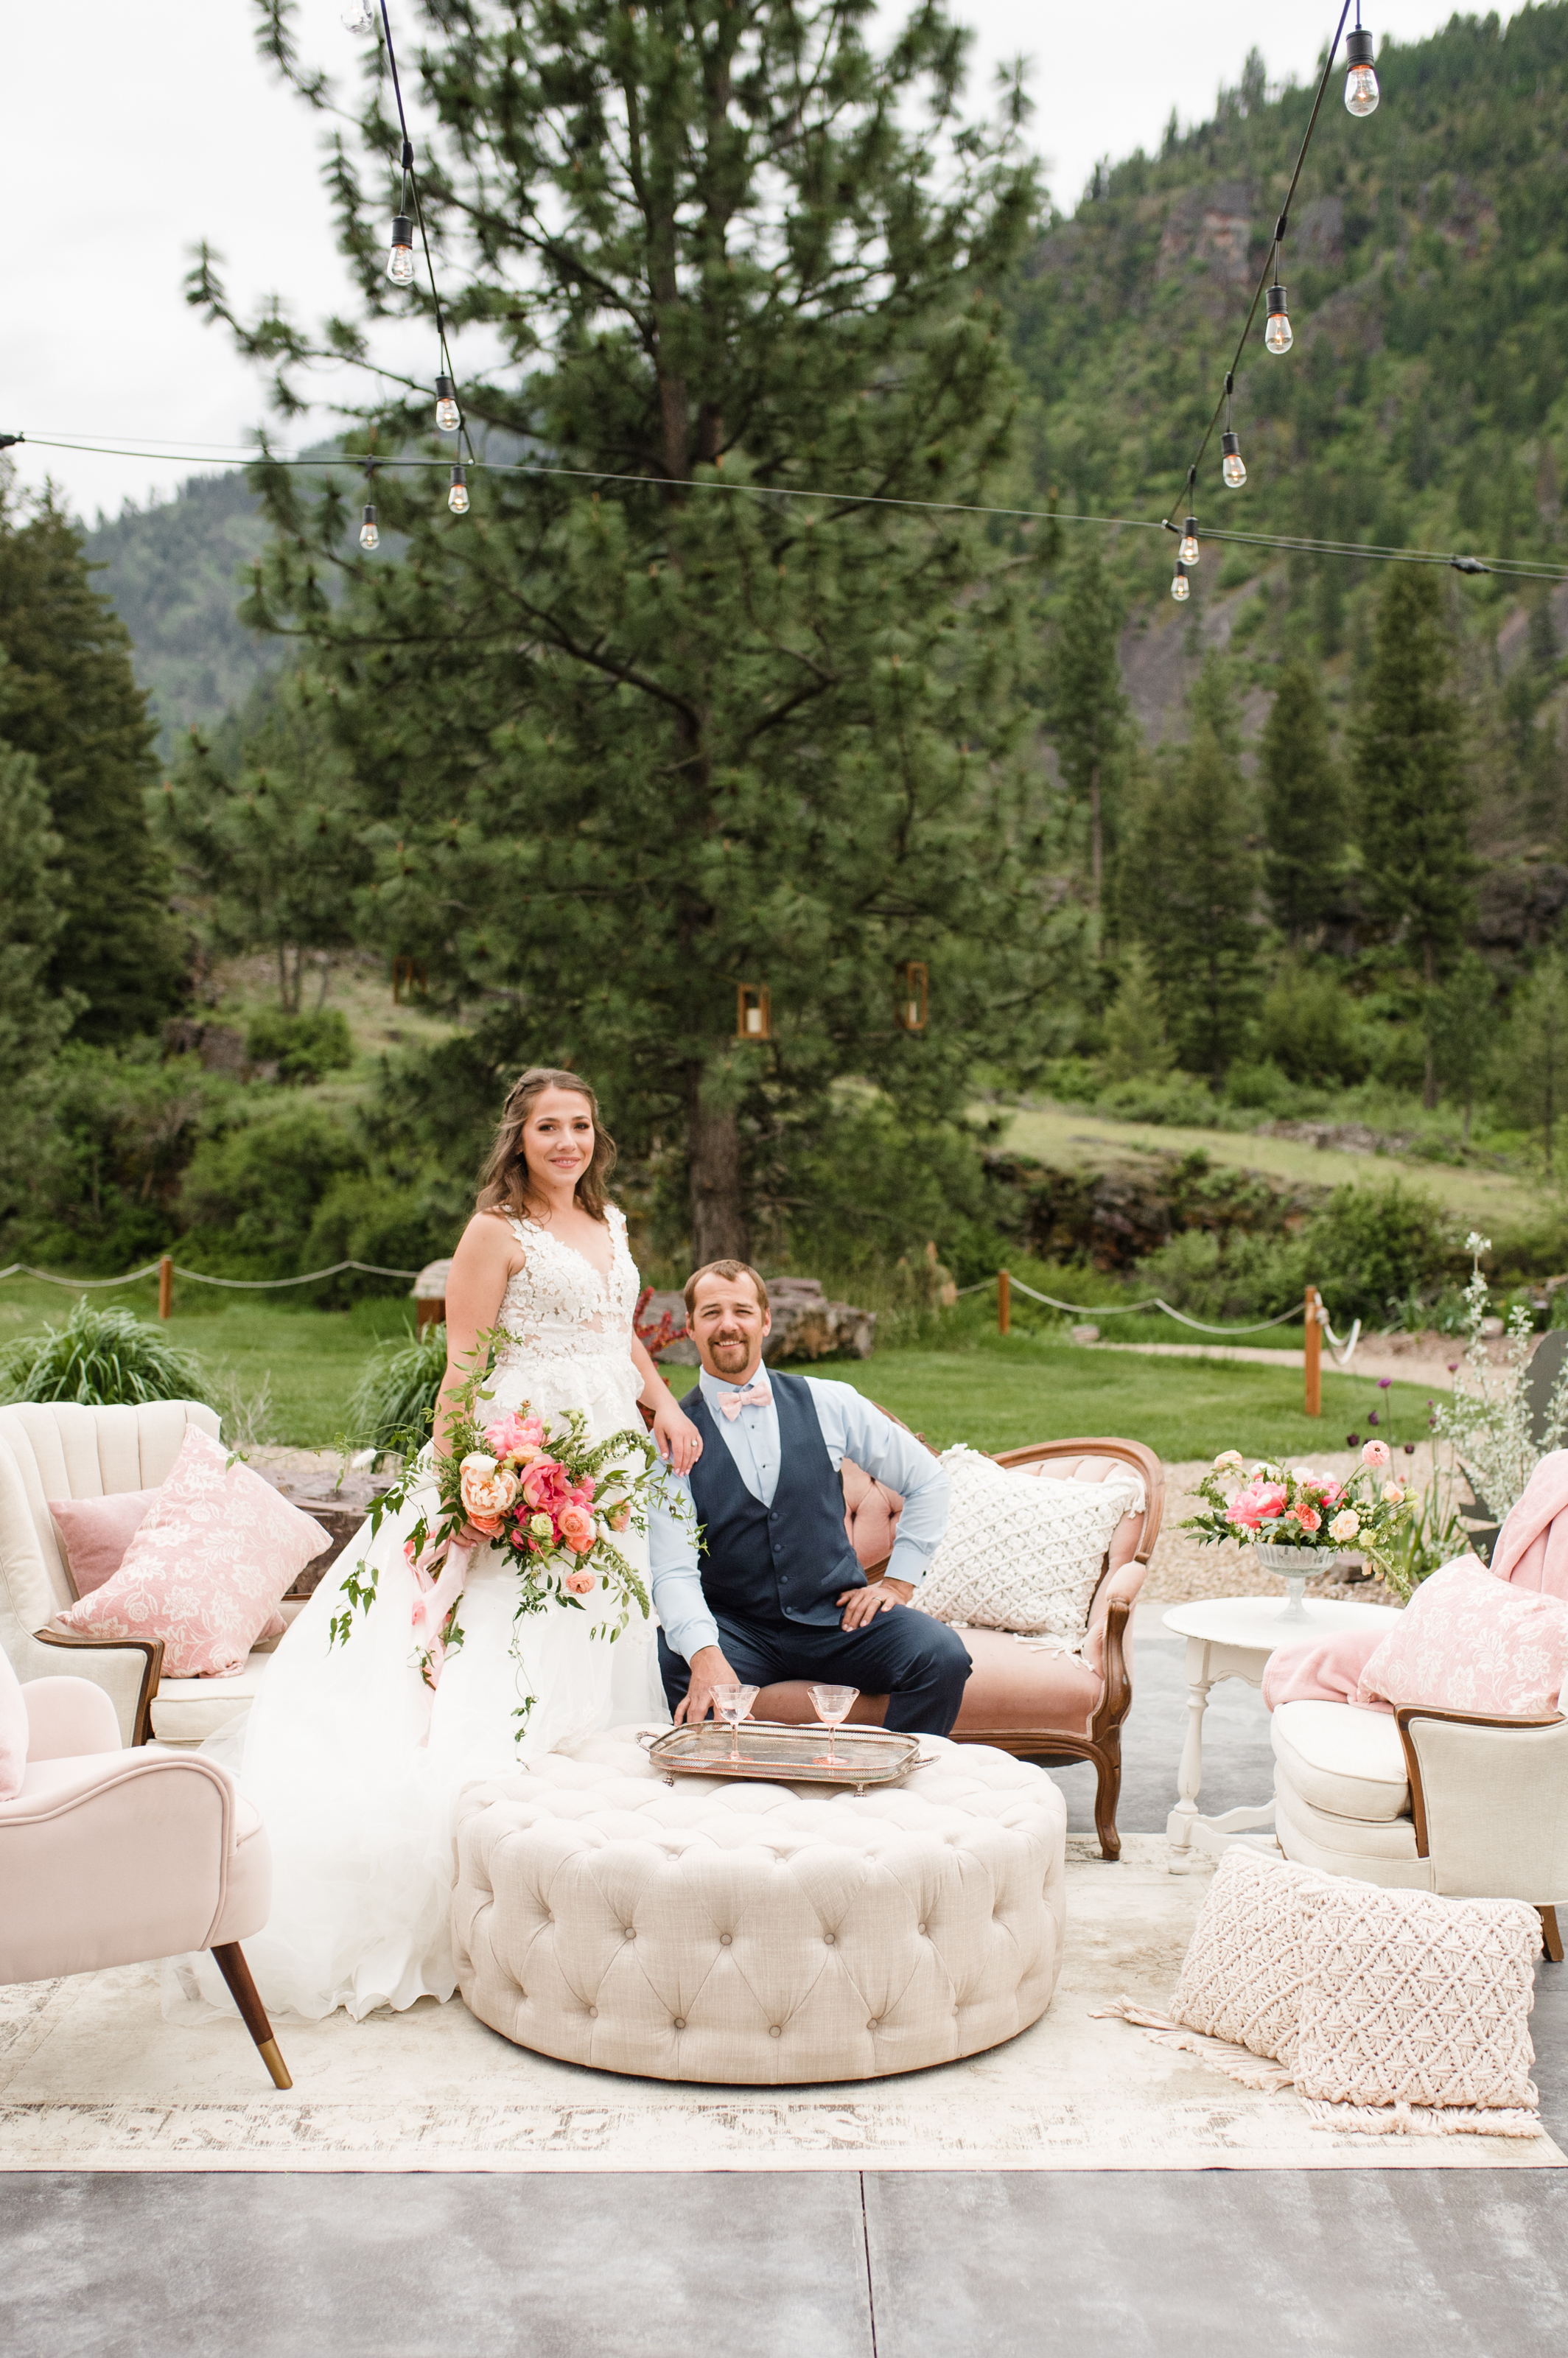 Coral Mountain Wedding at White Raven_Honeybee Weddings_May 23, 2019-294-81.jpg